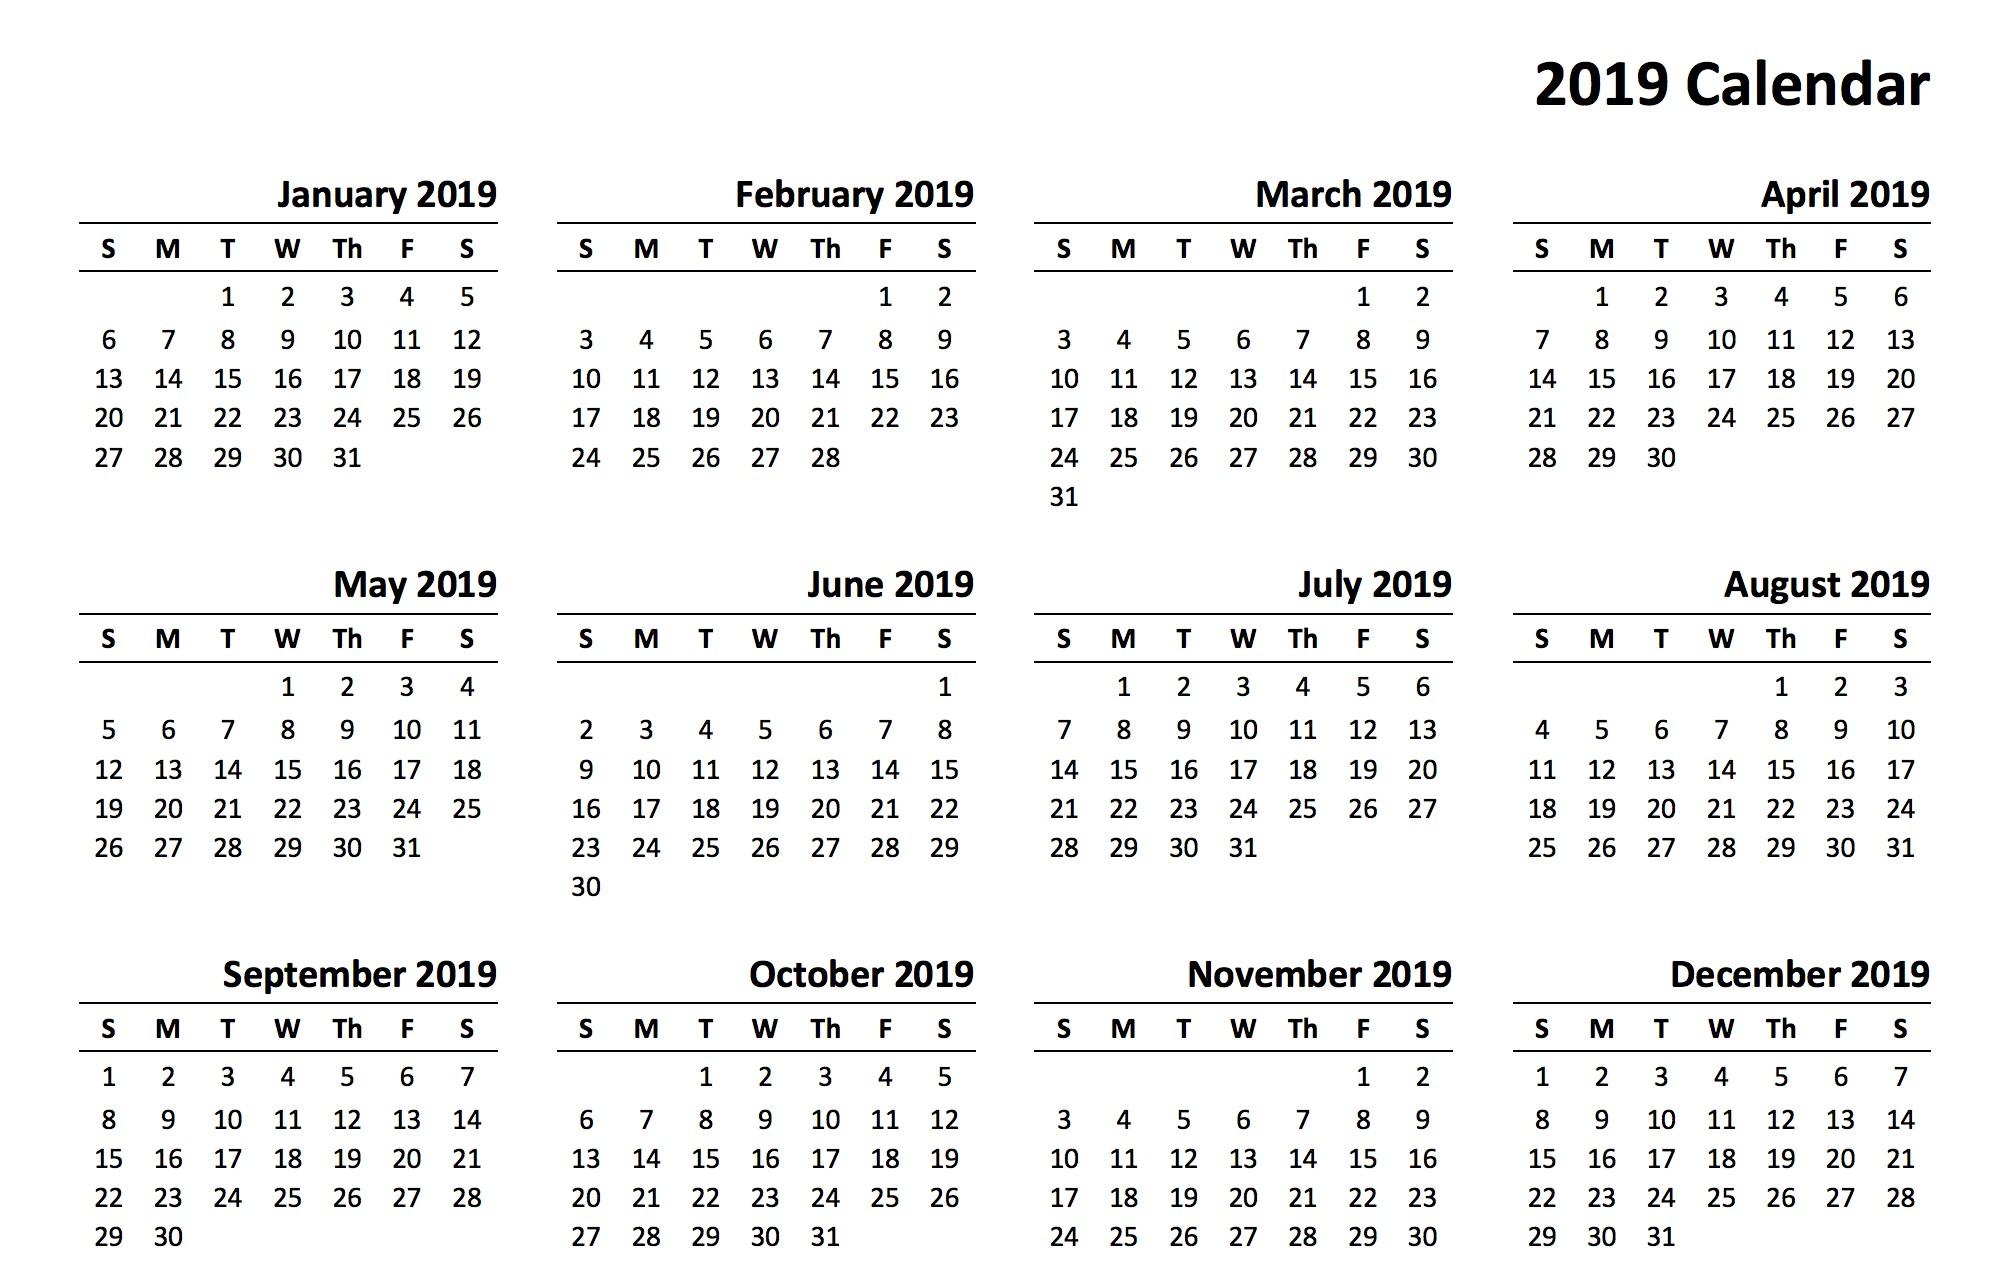 2019 Calendar Yearly Printable 2019 Calendar Amazonaws